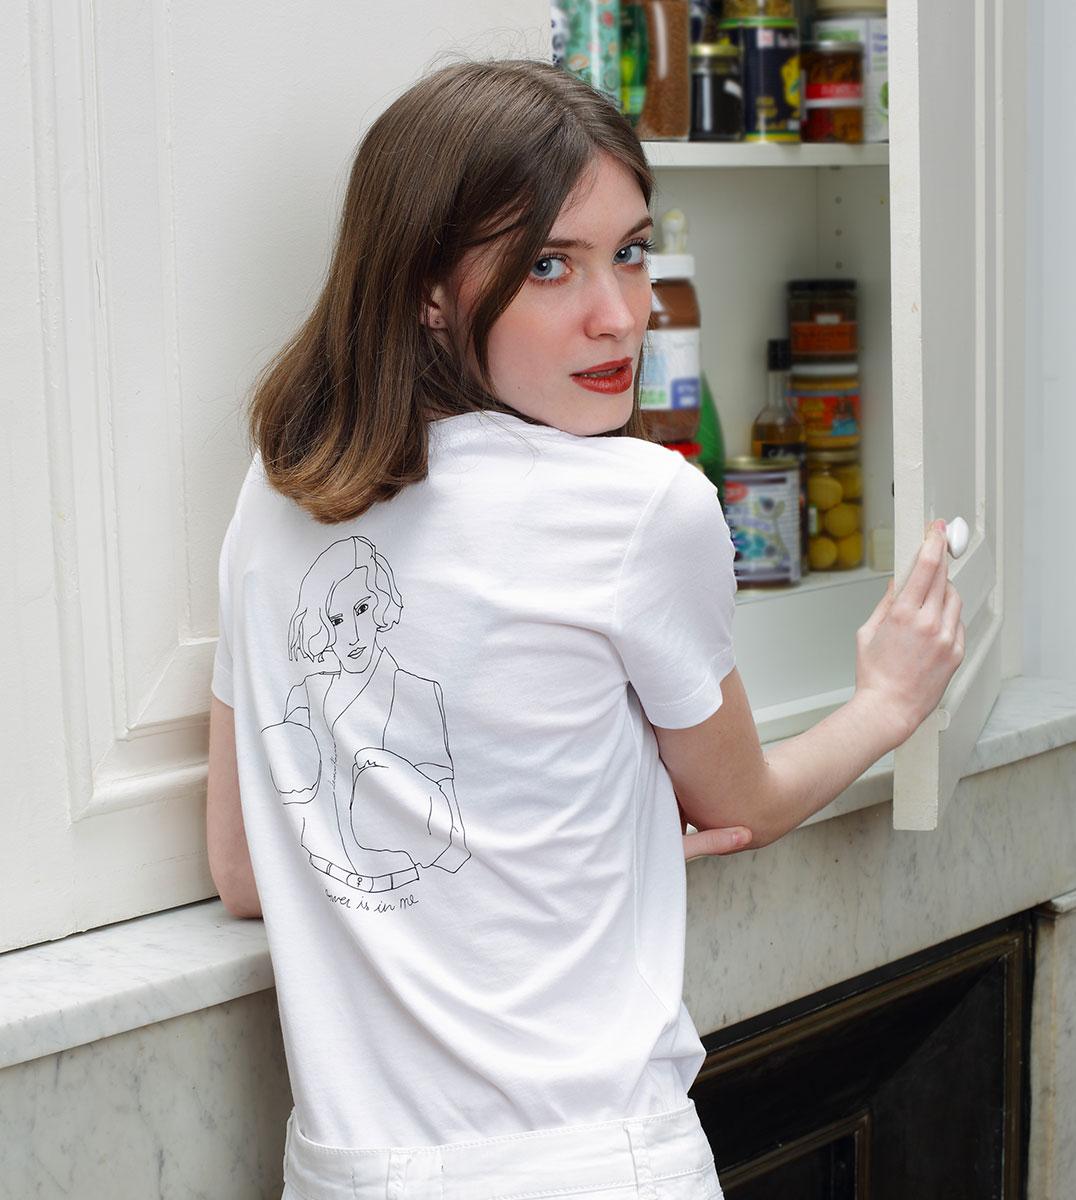 femme ouvrant un placard, elle porte un tshirt blanc en coton bio de la marque leonor roversi